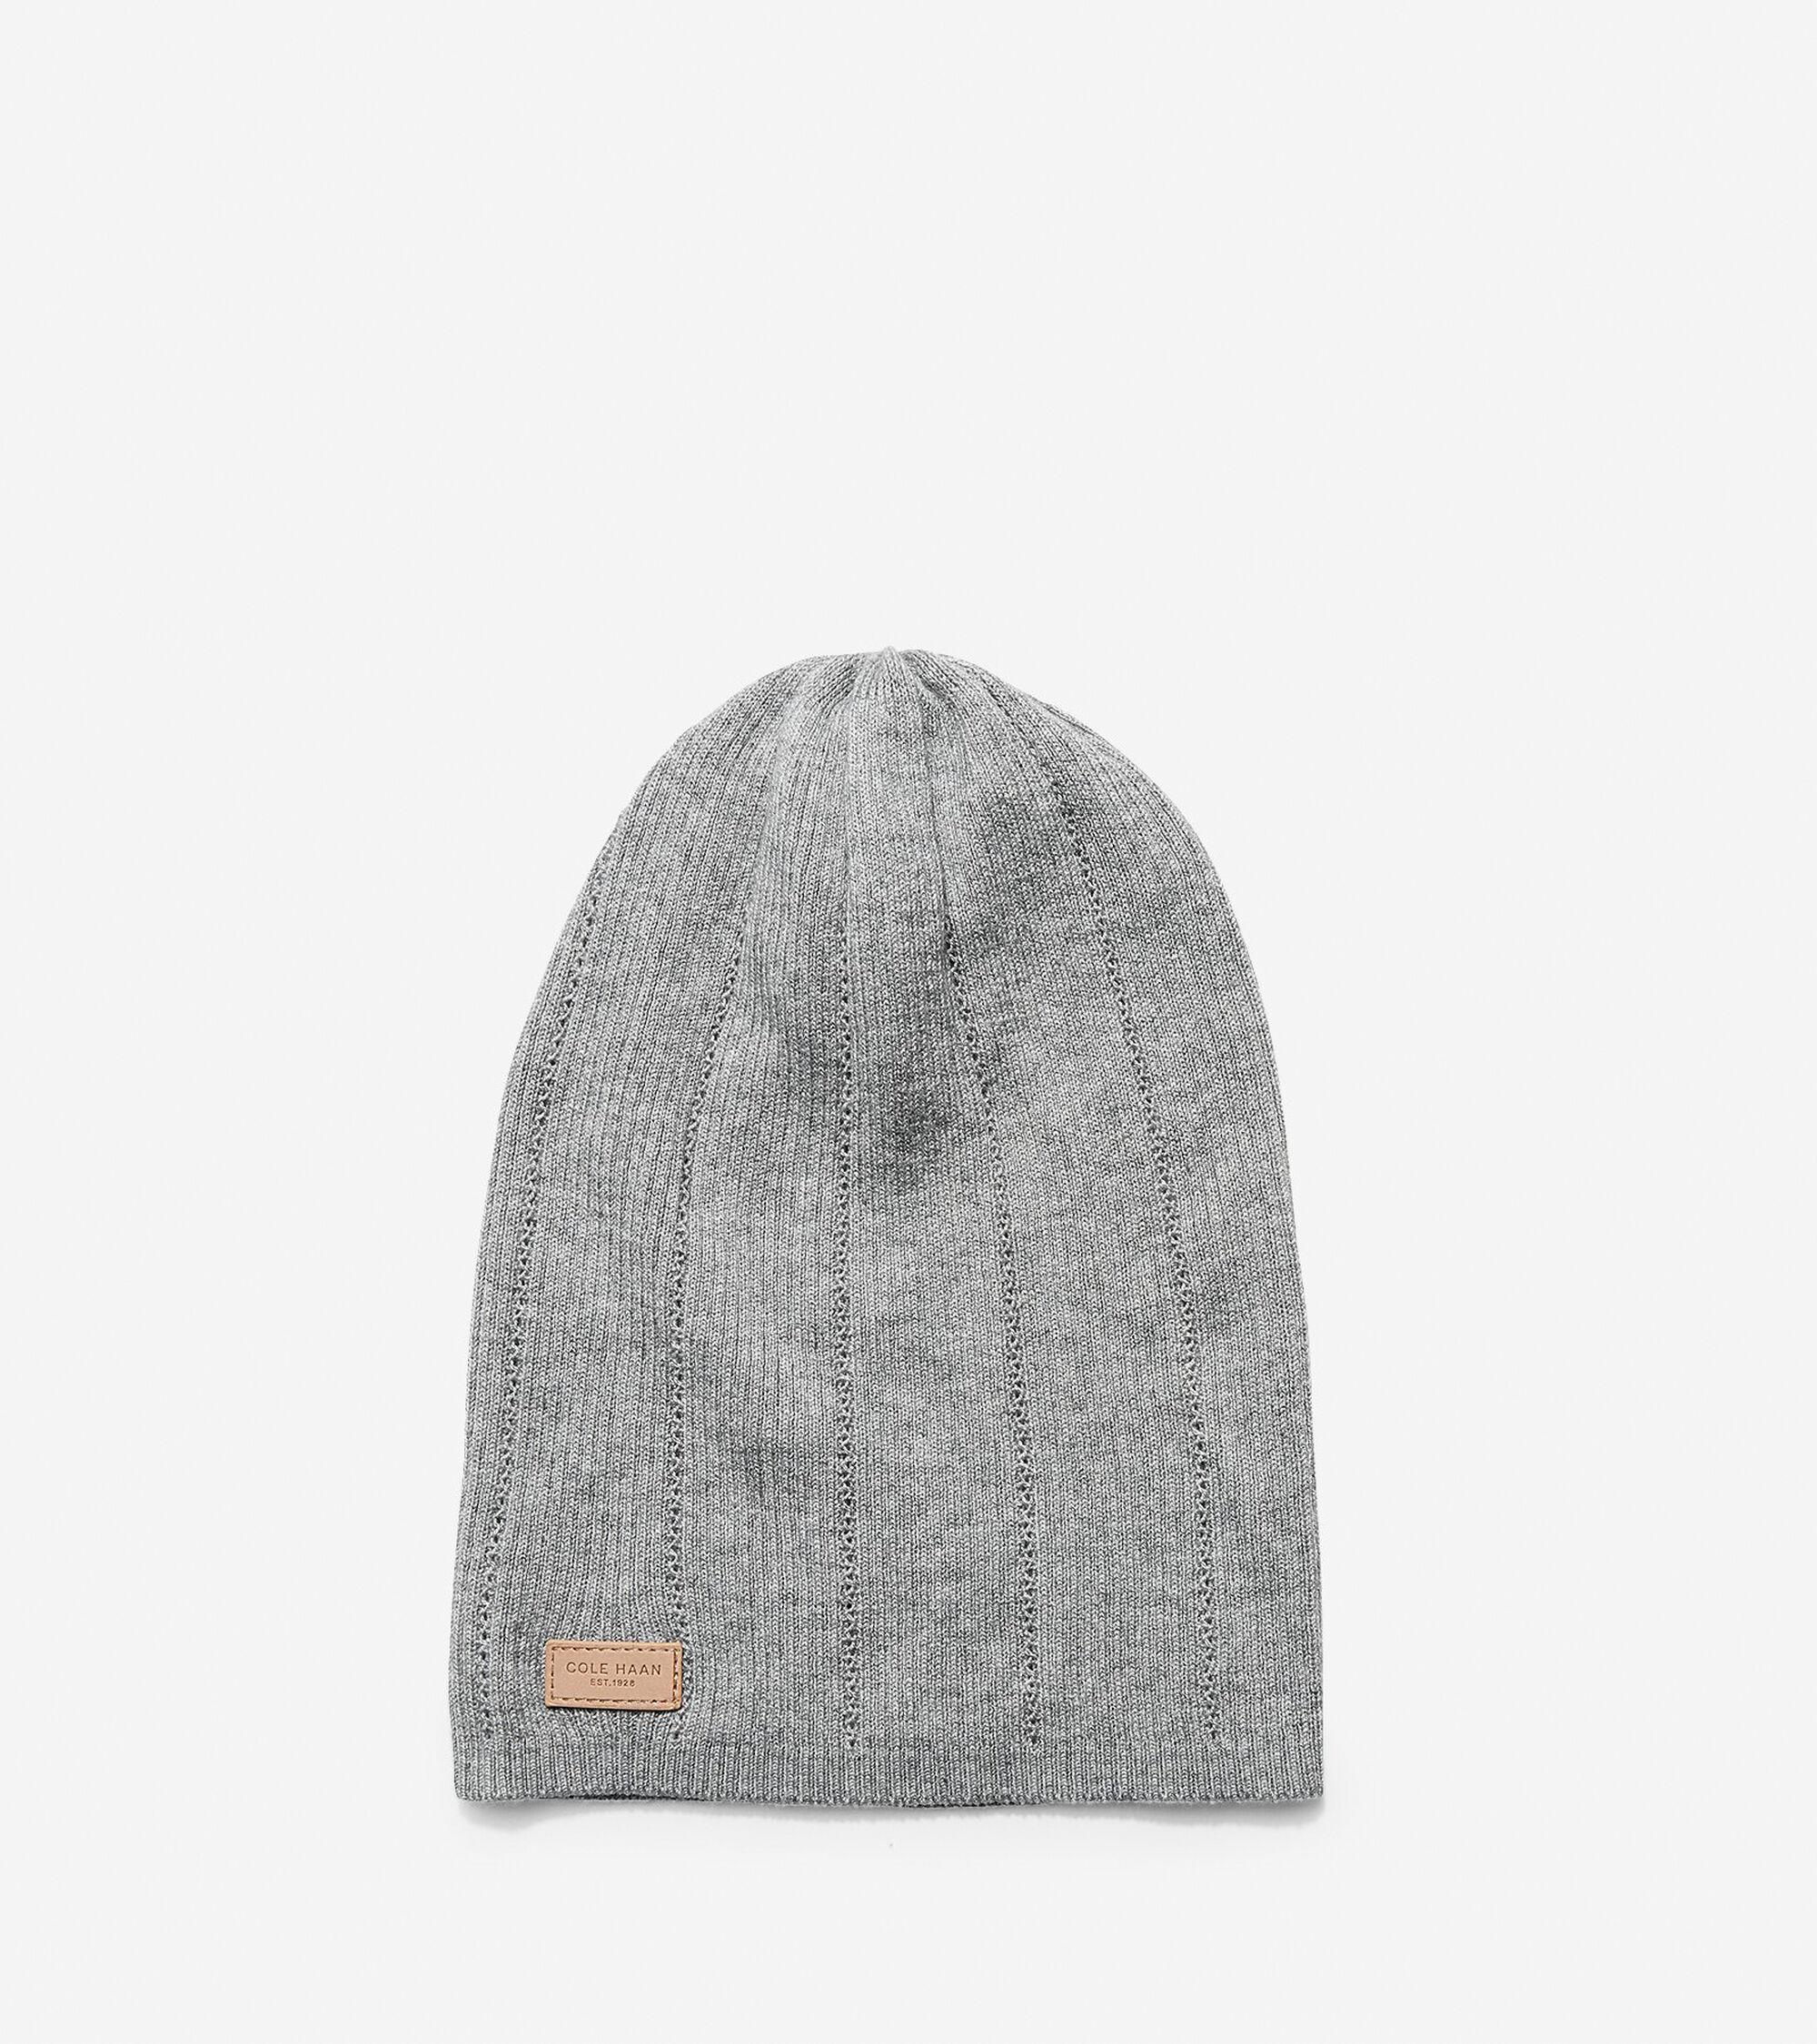 Women s Cashmere Blend Rib Pointelle Slouchy Beanie Hat in Light Gray  fe264baaa33